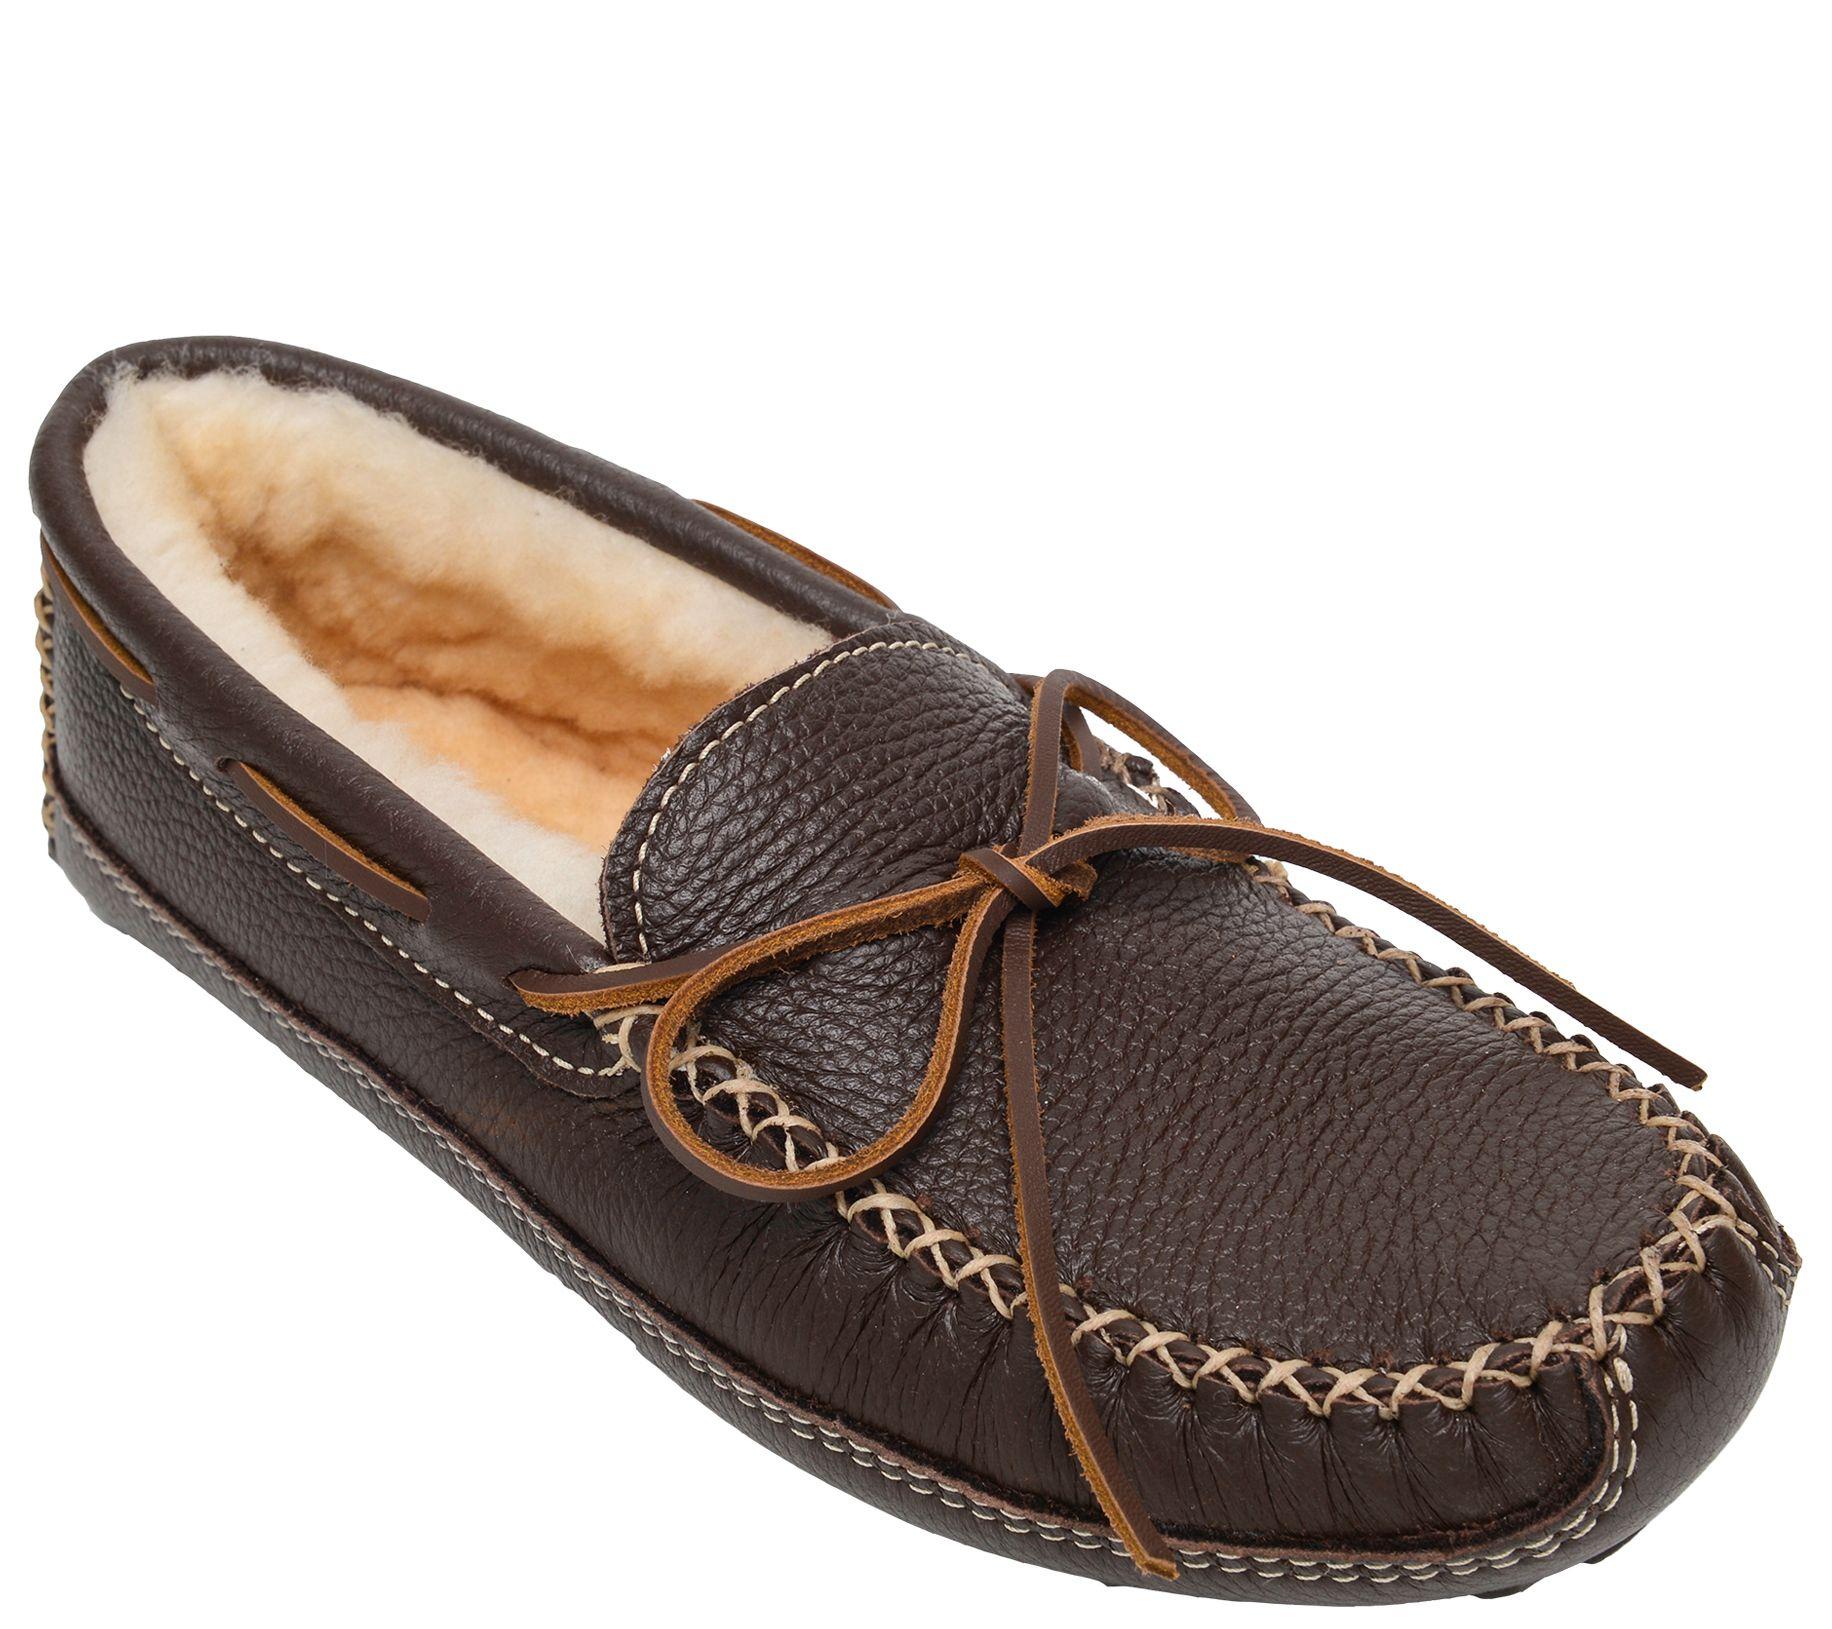 830ea24e102db9 Minnetonka Men s Sheepskin-Lined Chocolate Moose Slippers ...